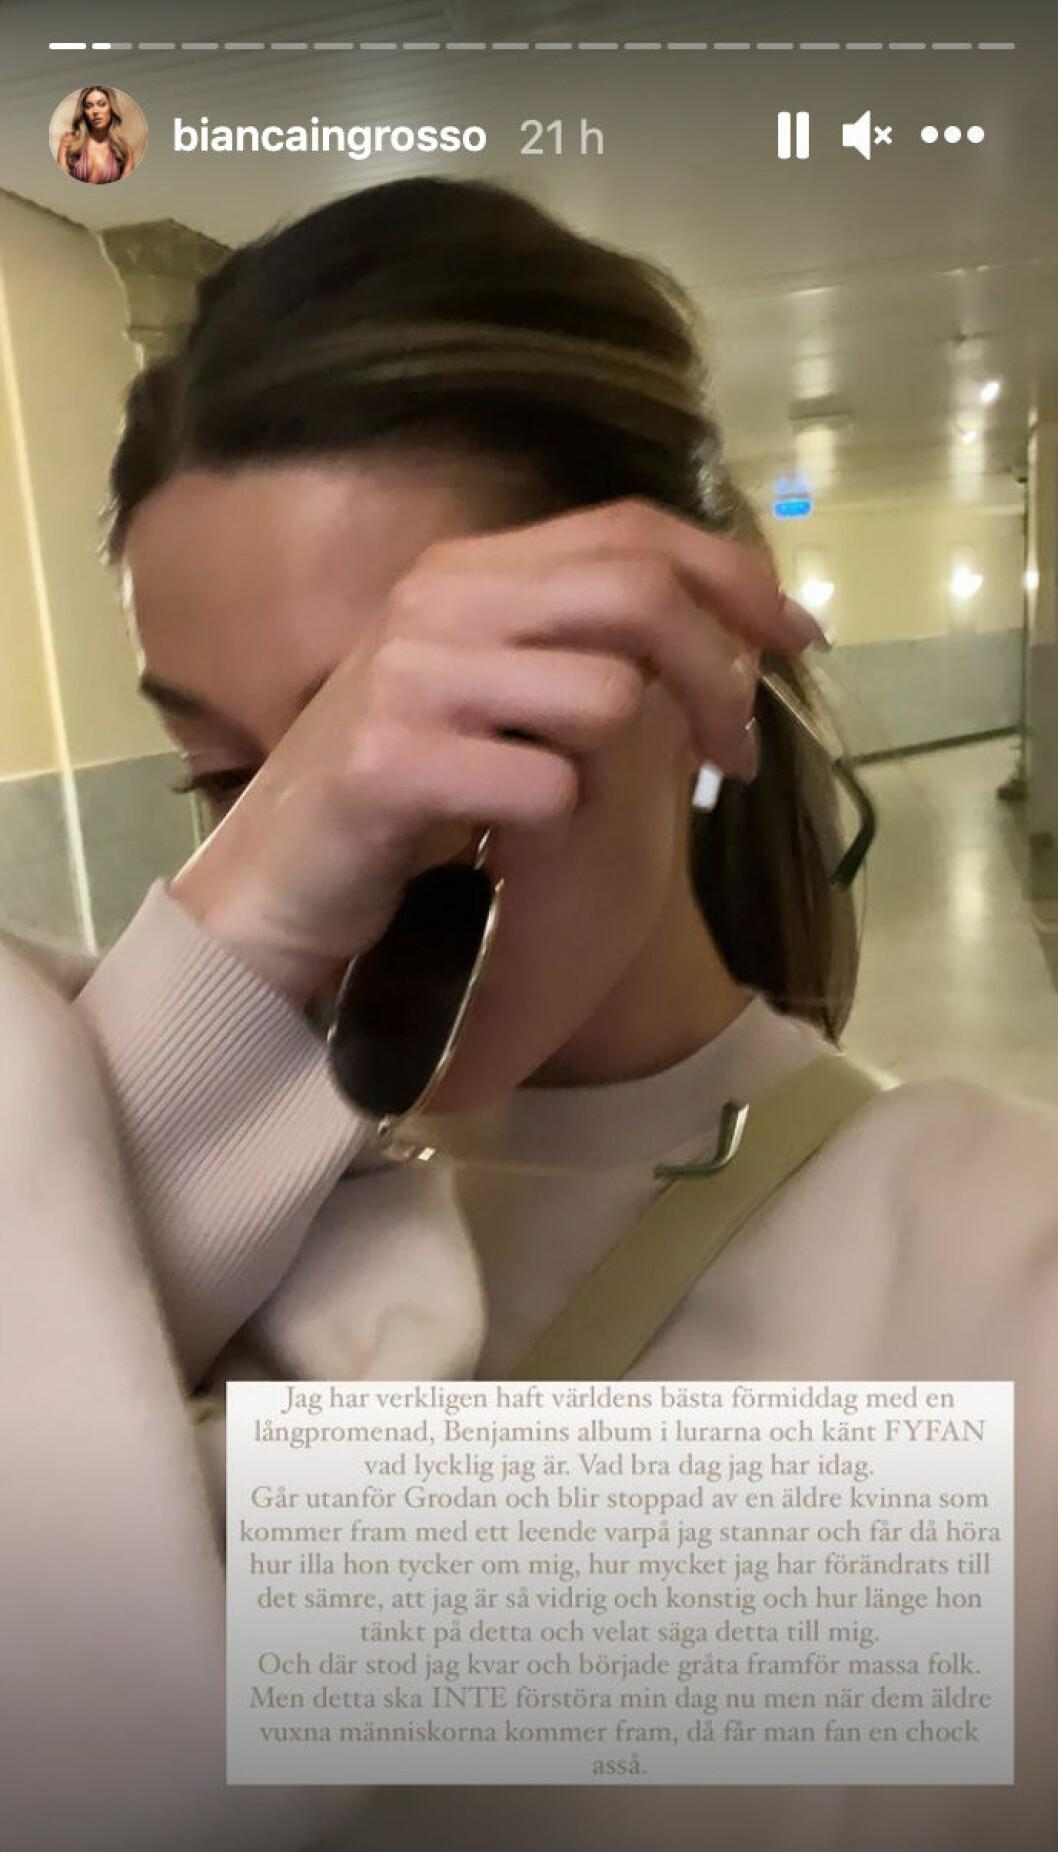 Bianca Ingrossos inlägg.